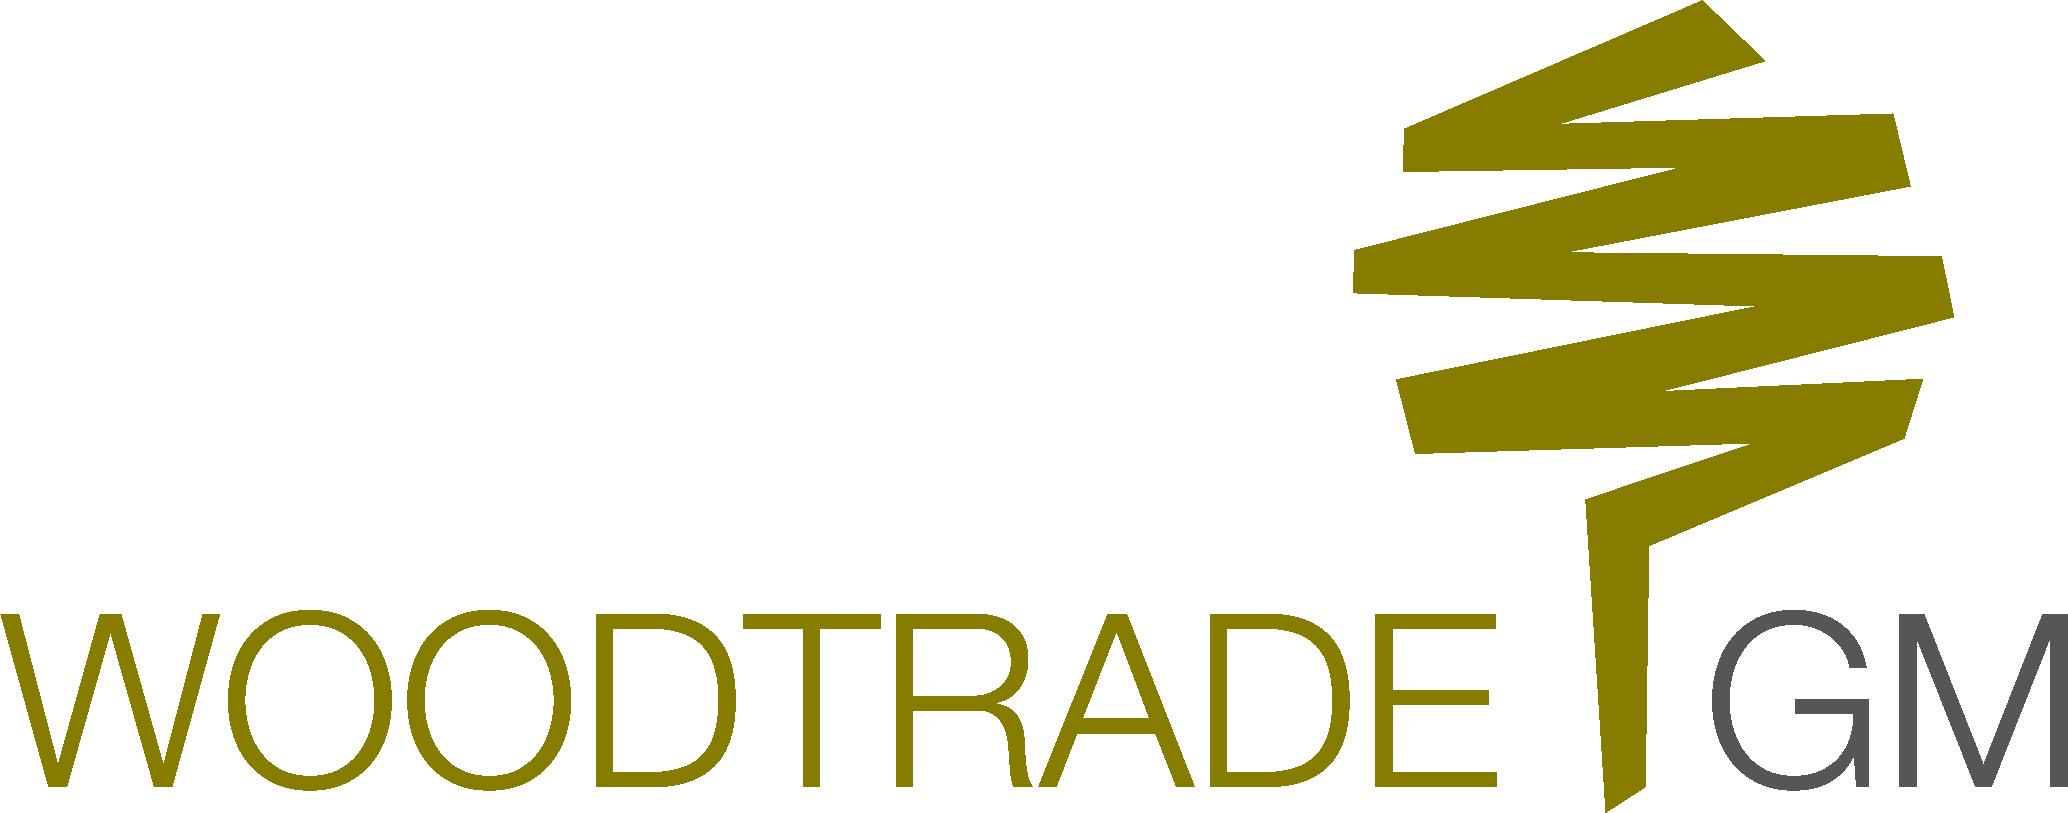 Woodtrade GM